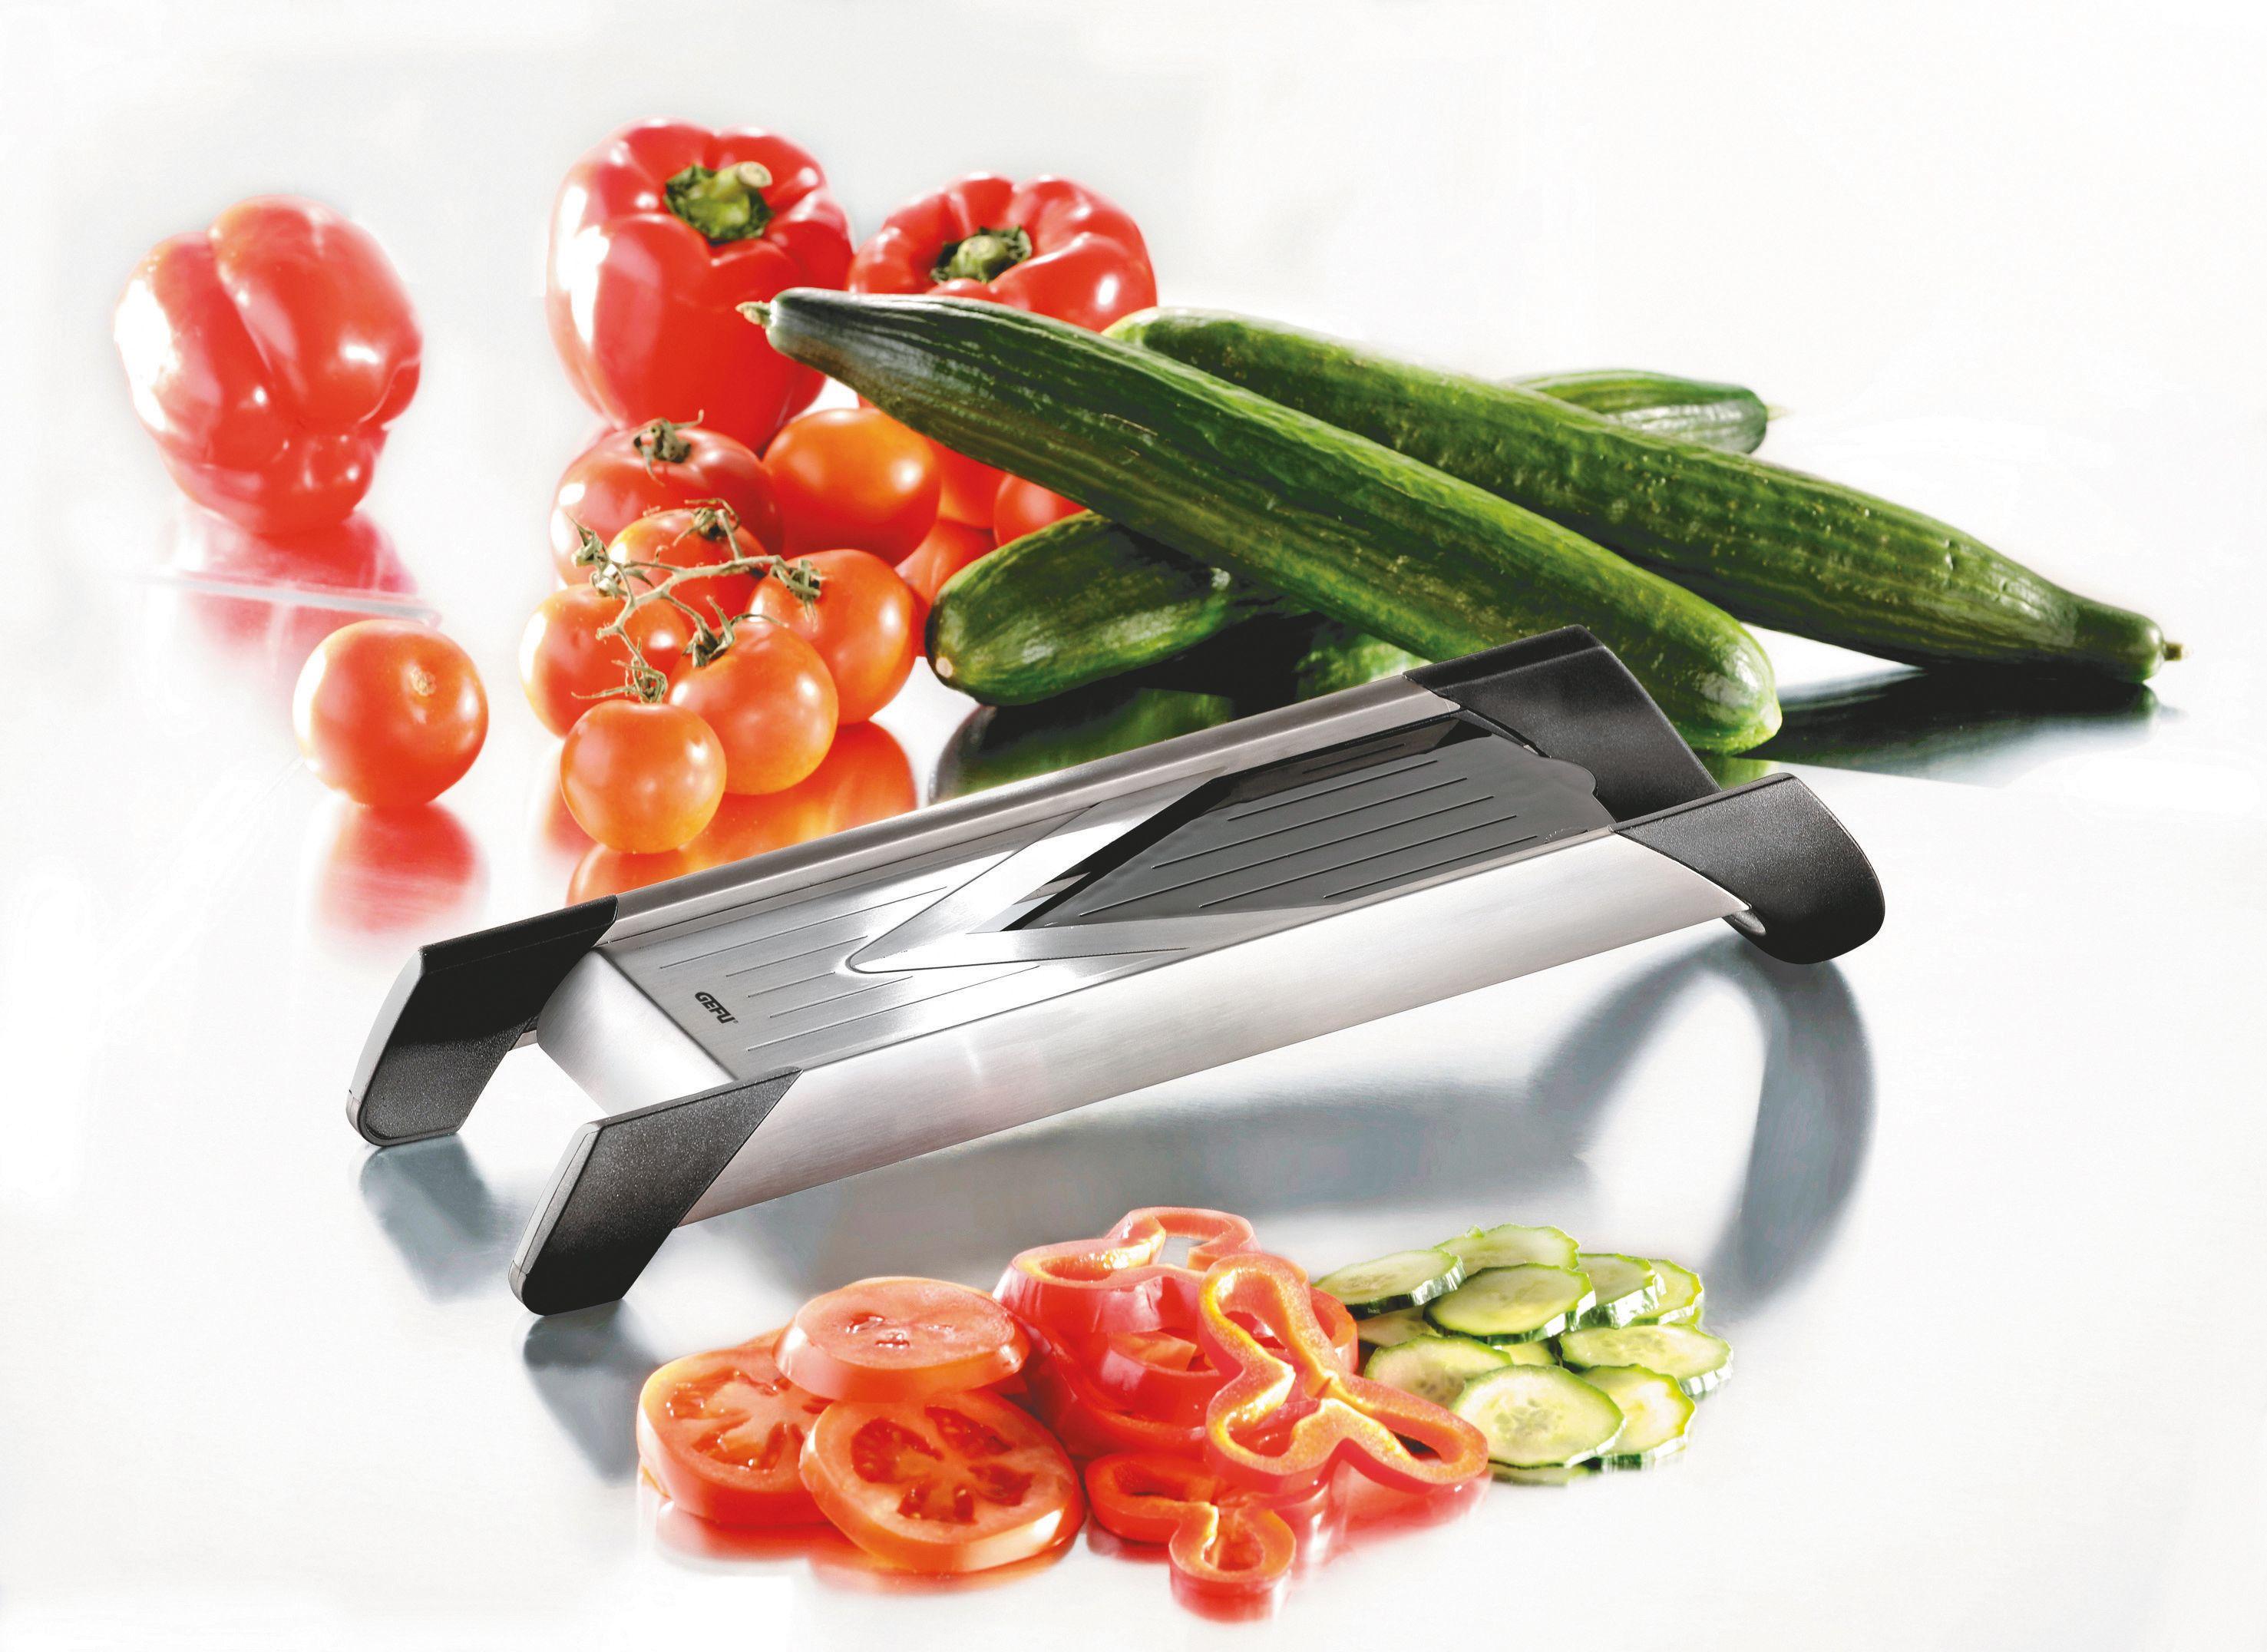 Culinaris Küchenaccessoires ~ Gefu apfelentkerner kern otto culinaris küchenaccessoires